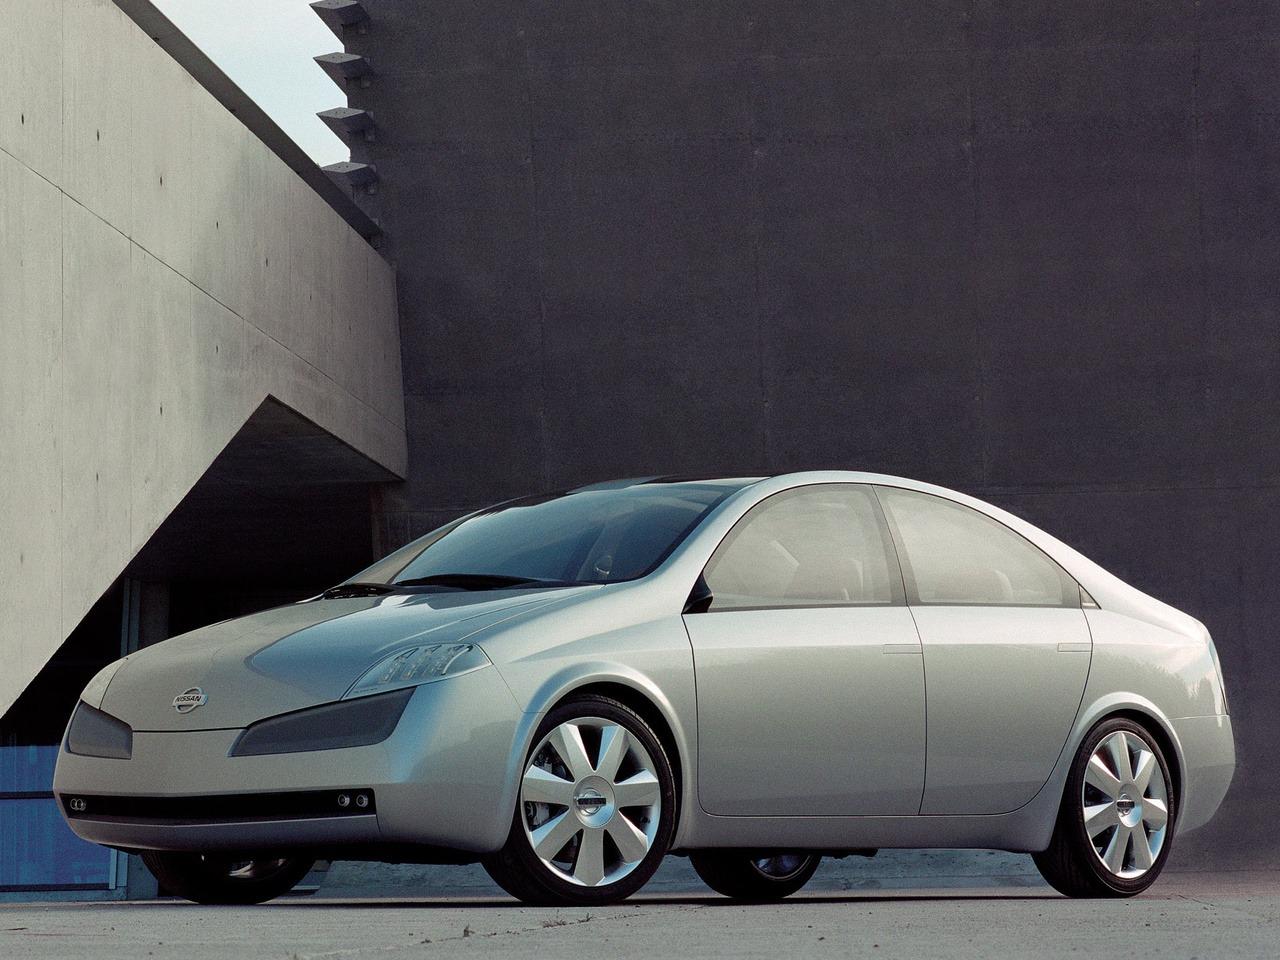 nissan fusion concept 2000 old concept cars. Black Bedroom Furniture Sets. Home Design Ideas